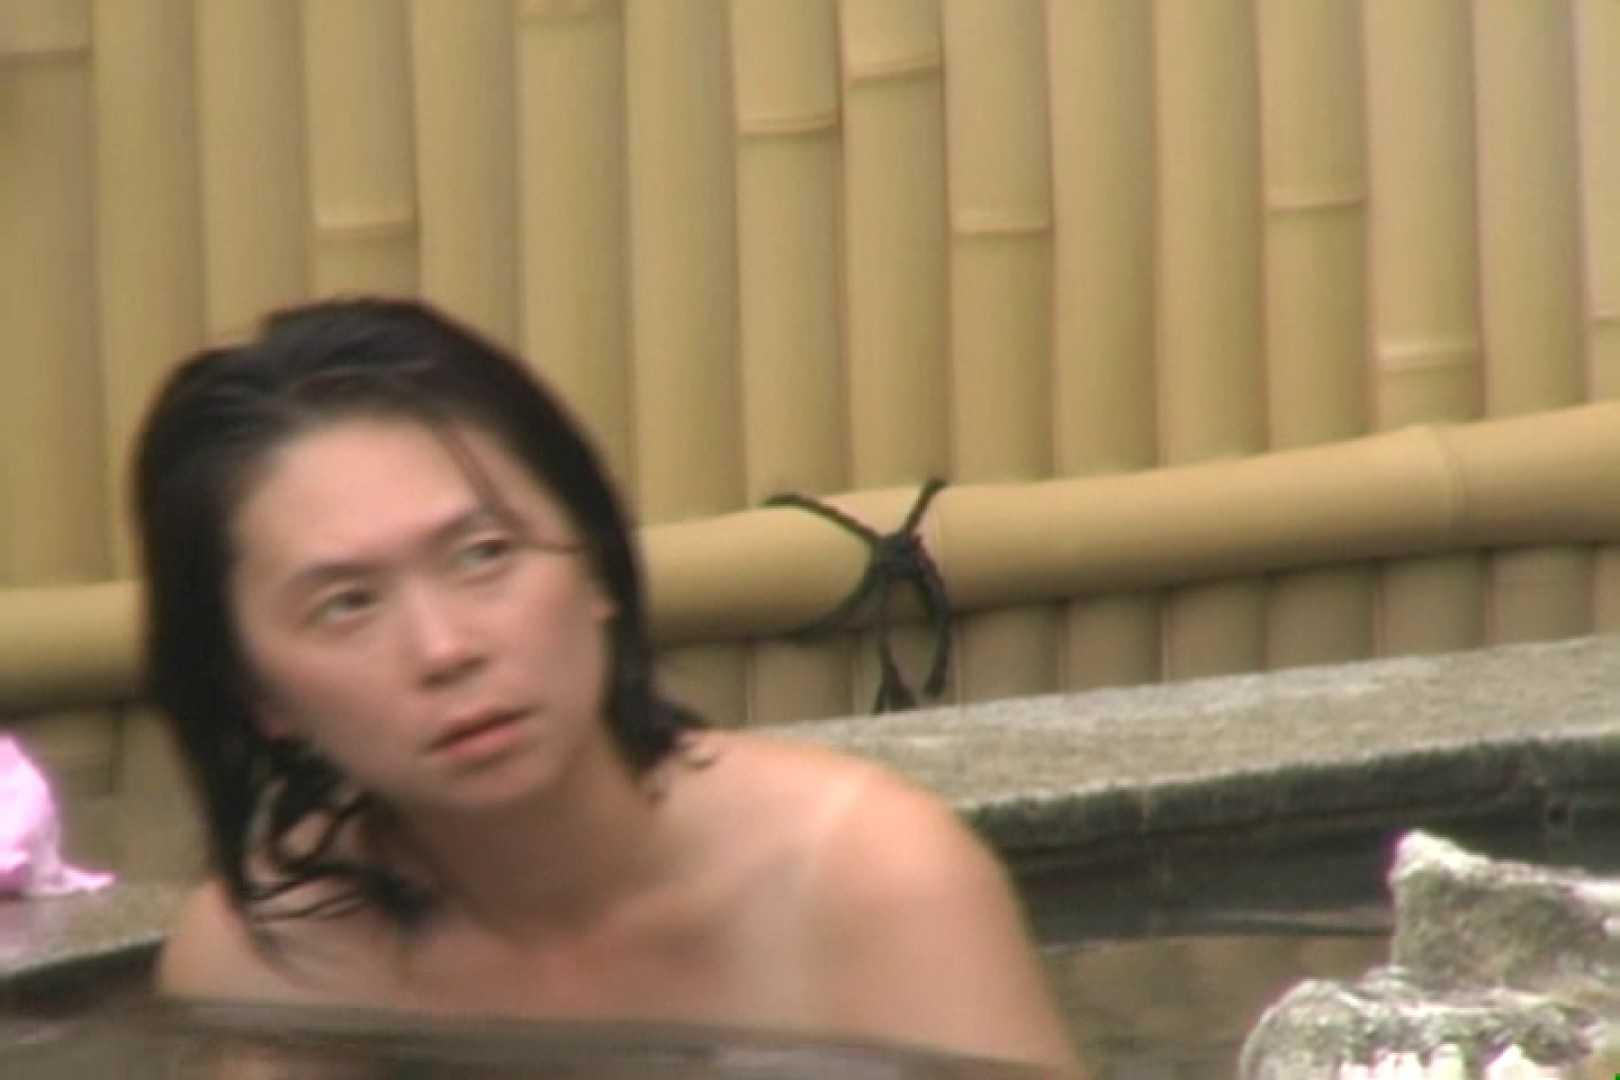 Aquaな露天風呂Vol.619 エッチな盗撮 ワレメ無修正動画無料 107pic 78